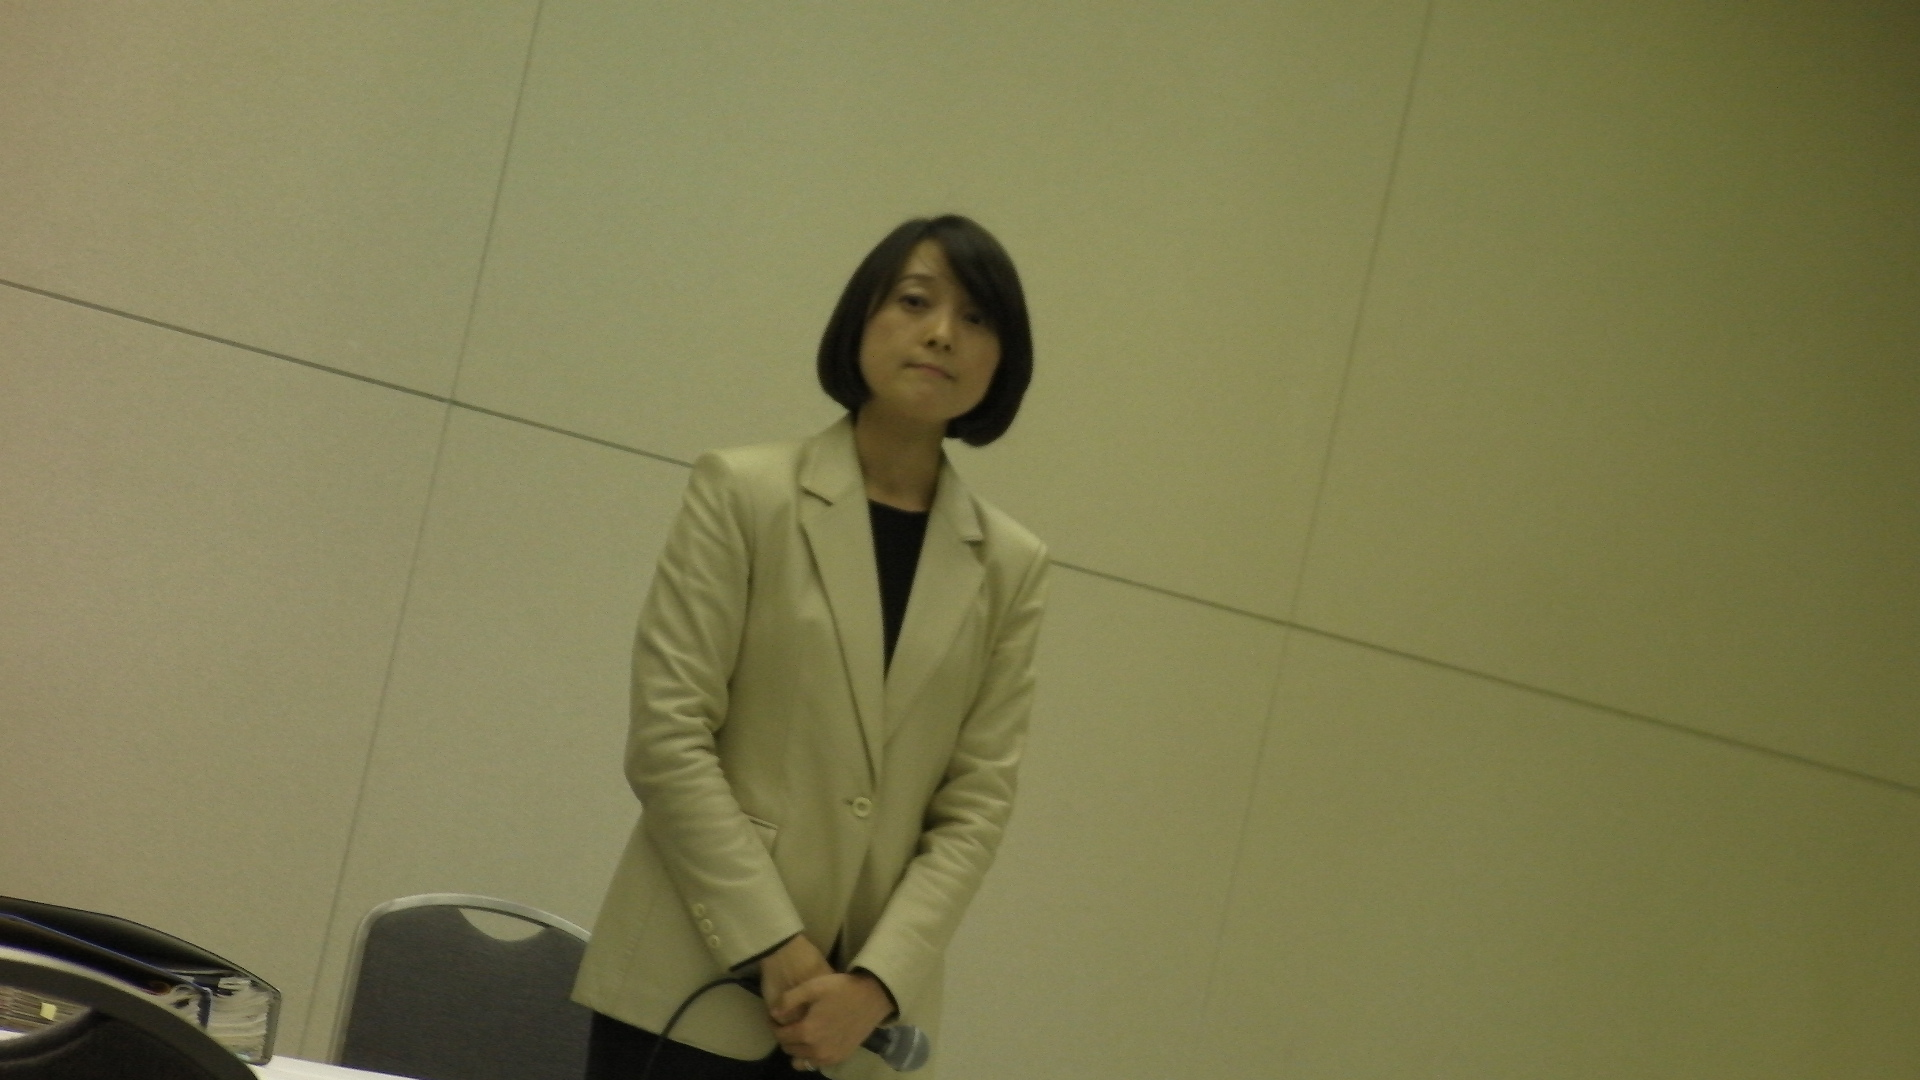 http://daily.magazine9.jp/m9/oshidori/SANY0670.JPG